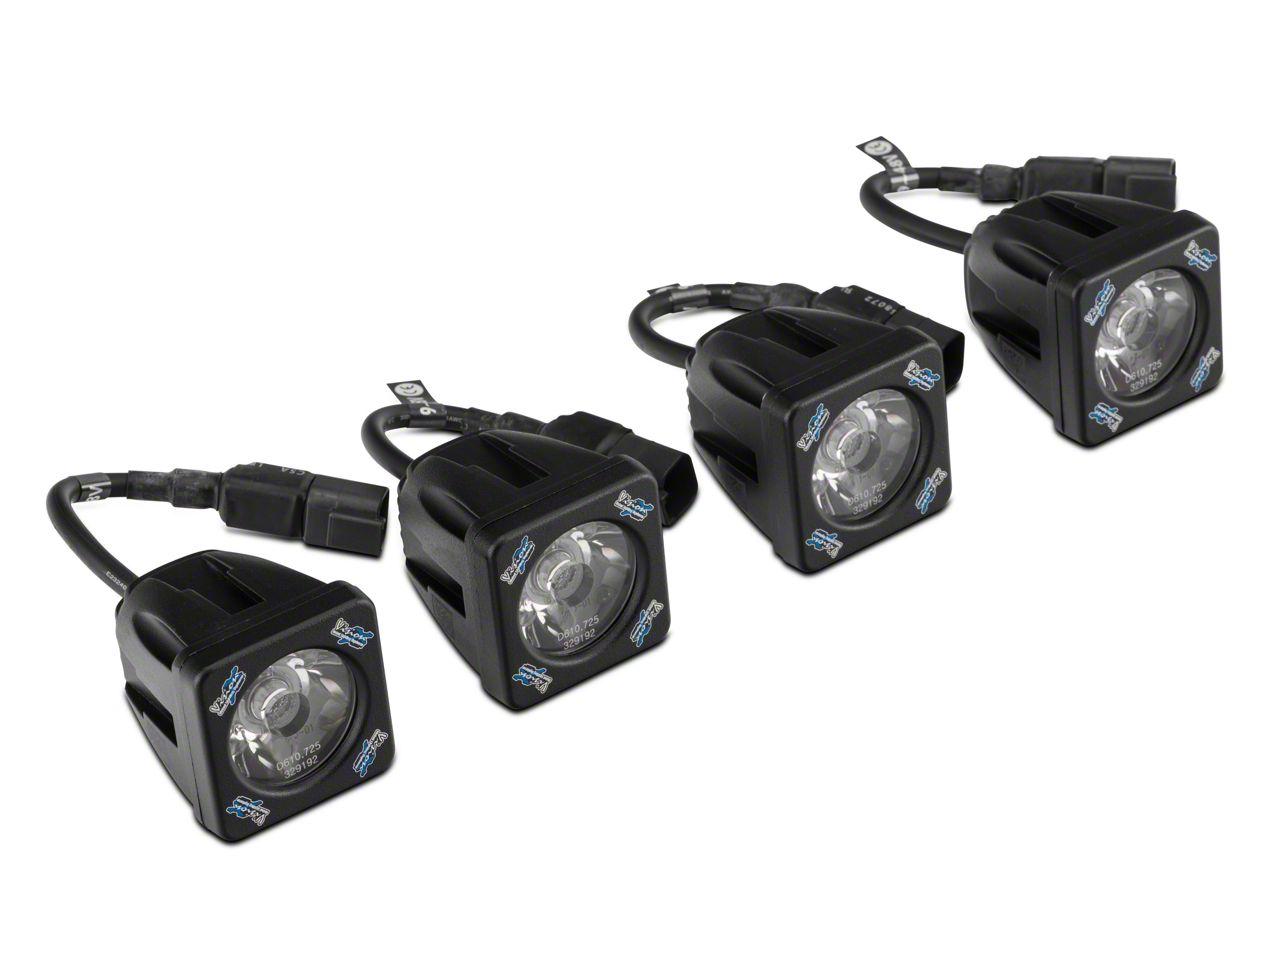 Vision X Fog Light Mounting Kit w/ Square LED Lights (07-13 Silverado 1500)